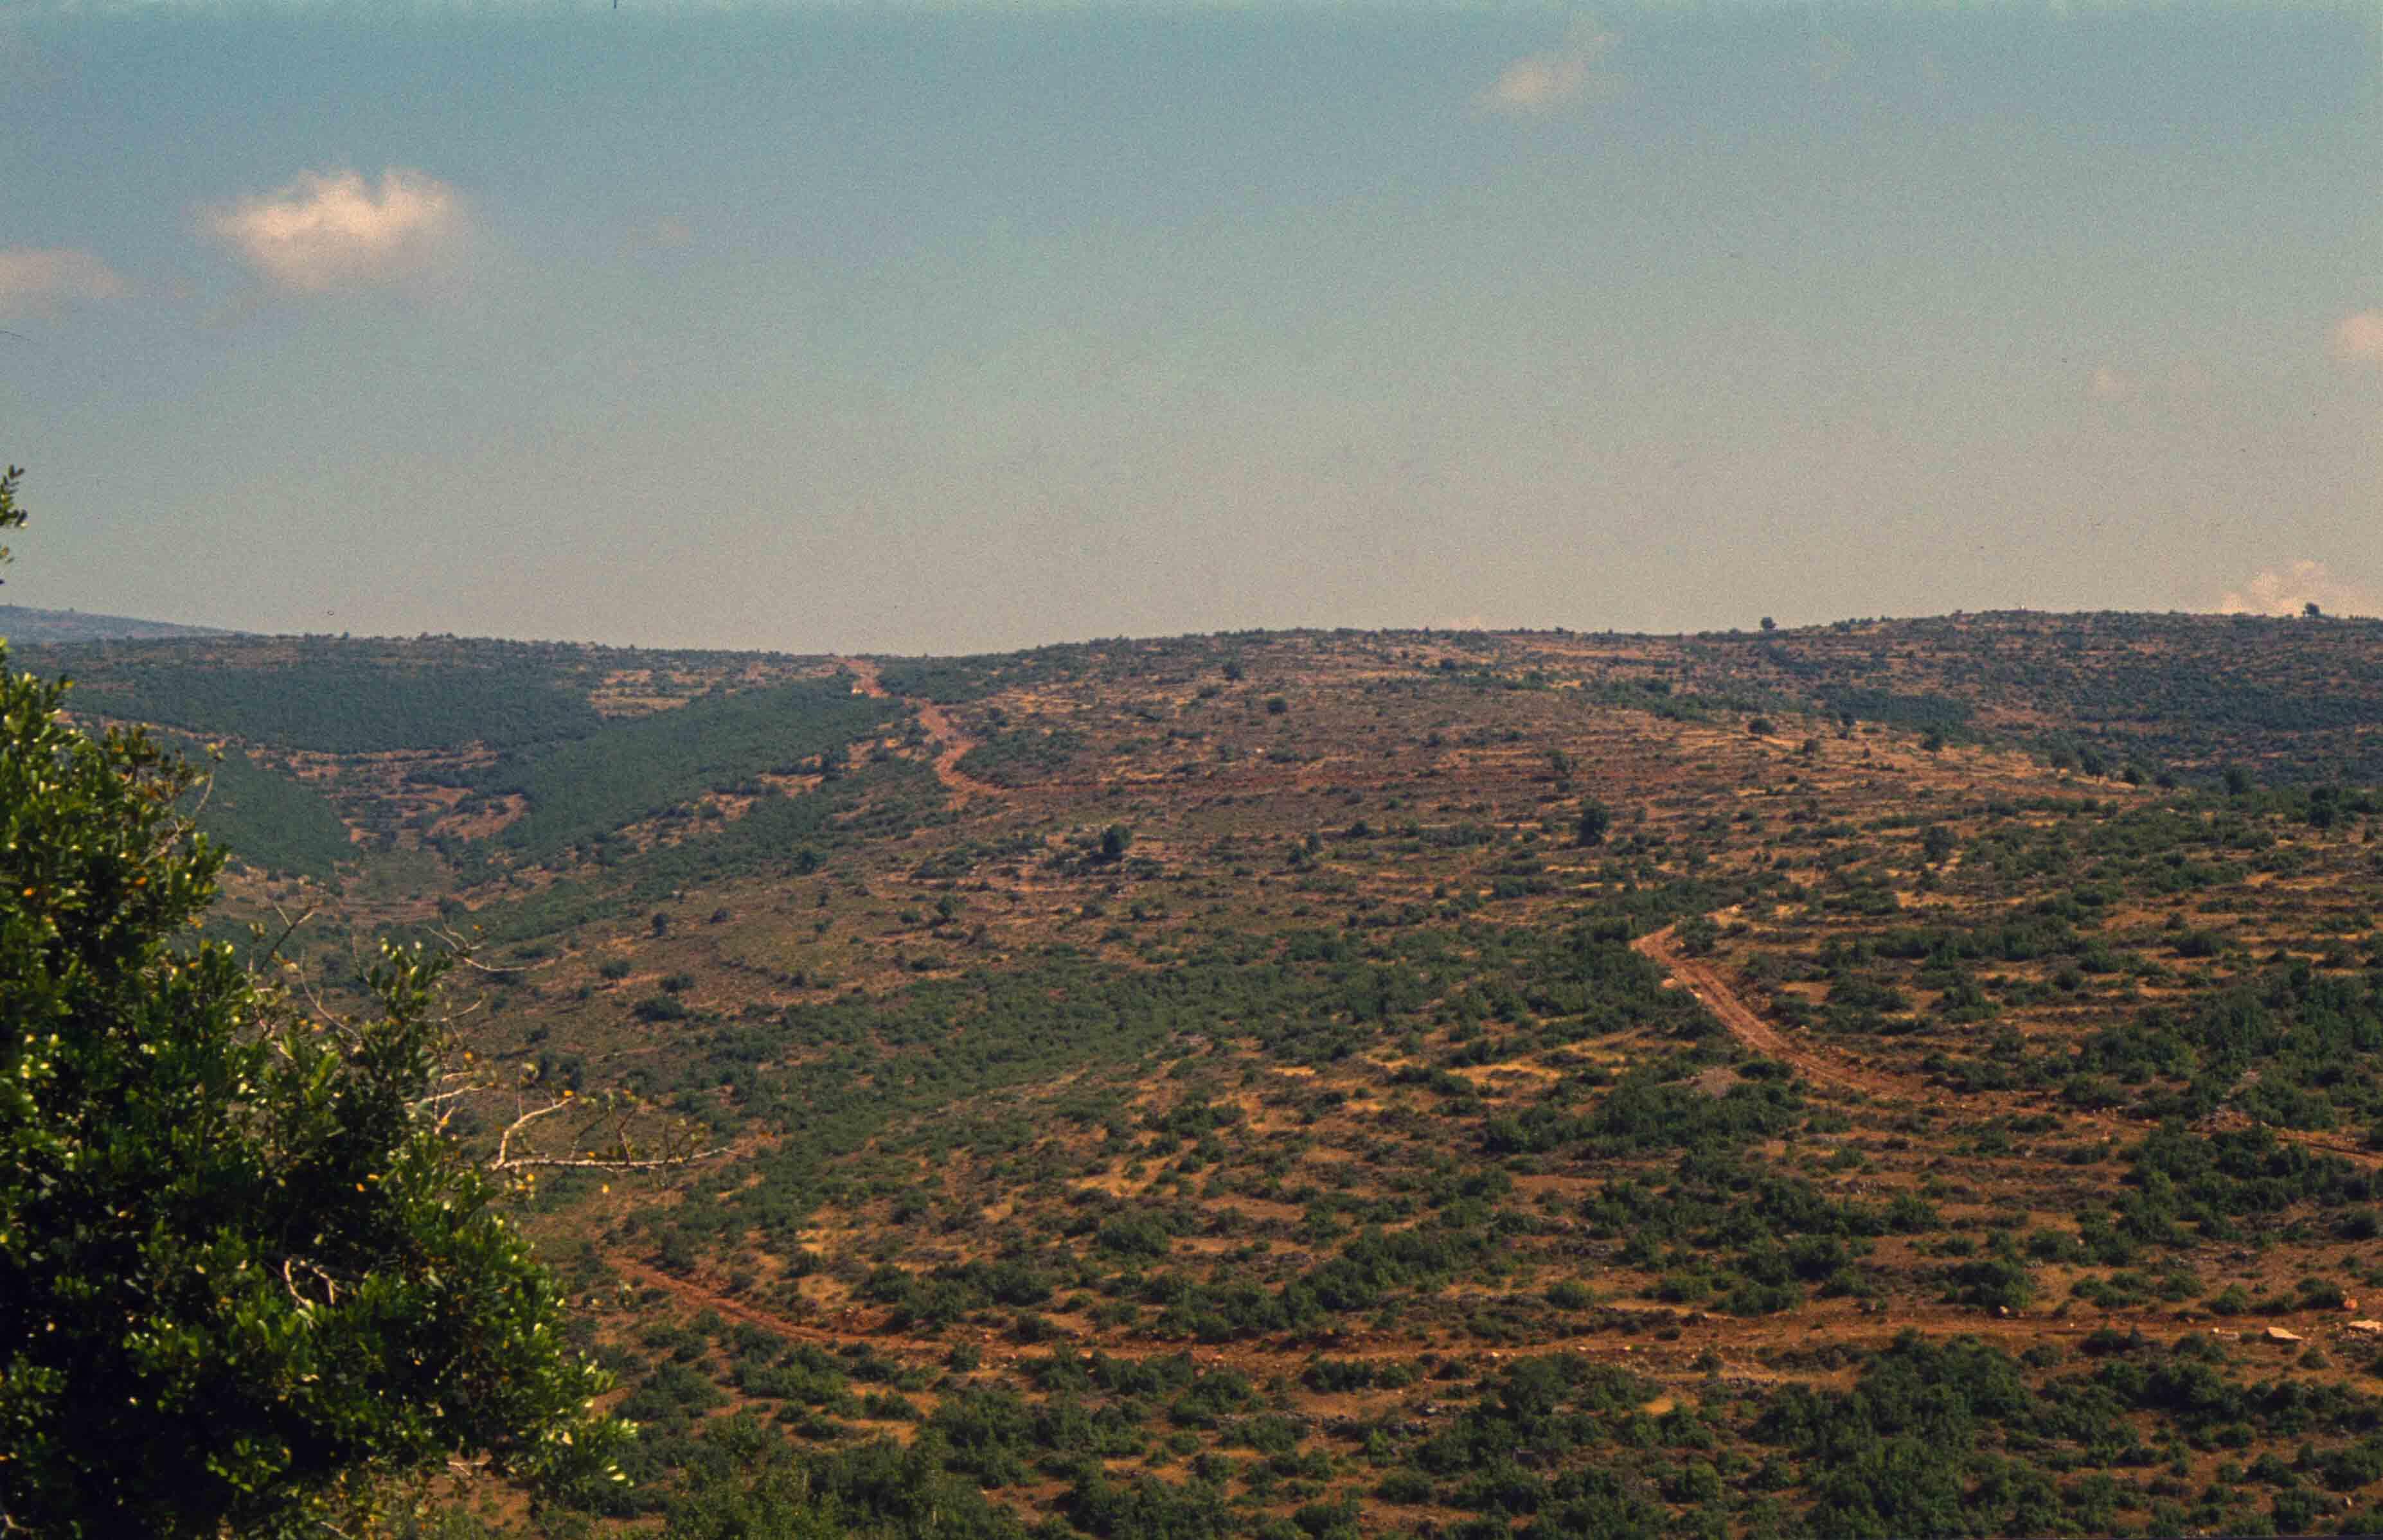 121. Libanon